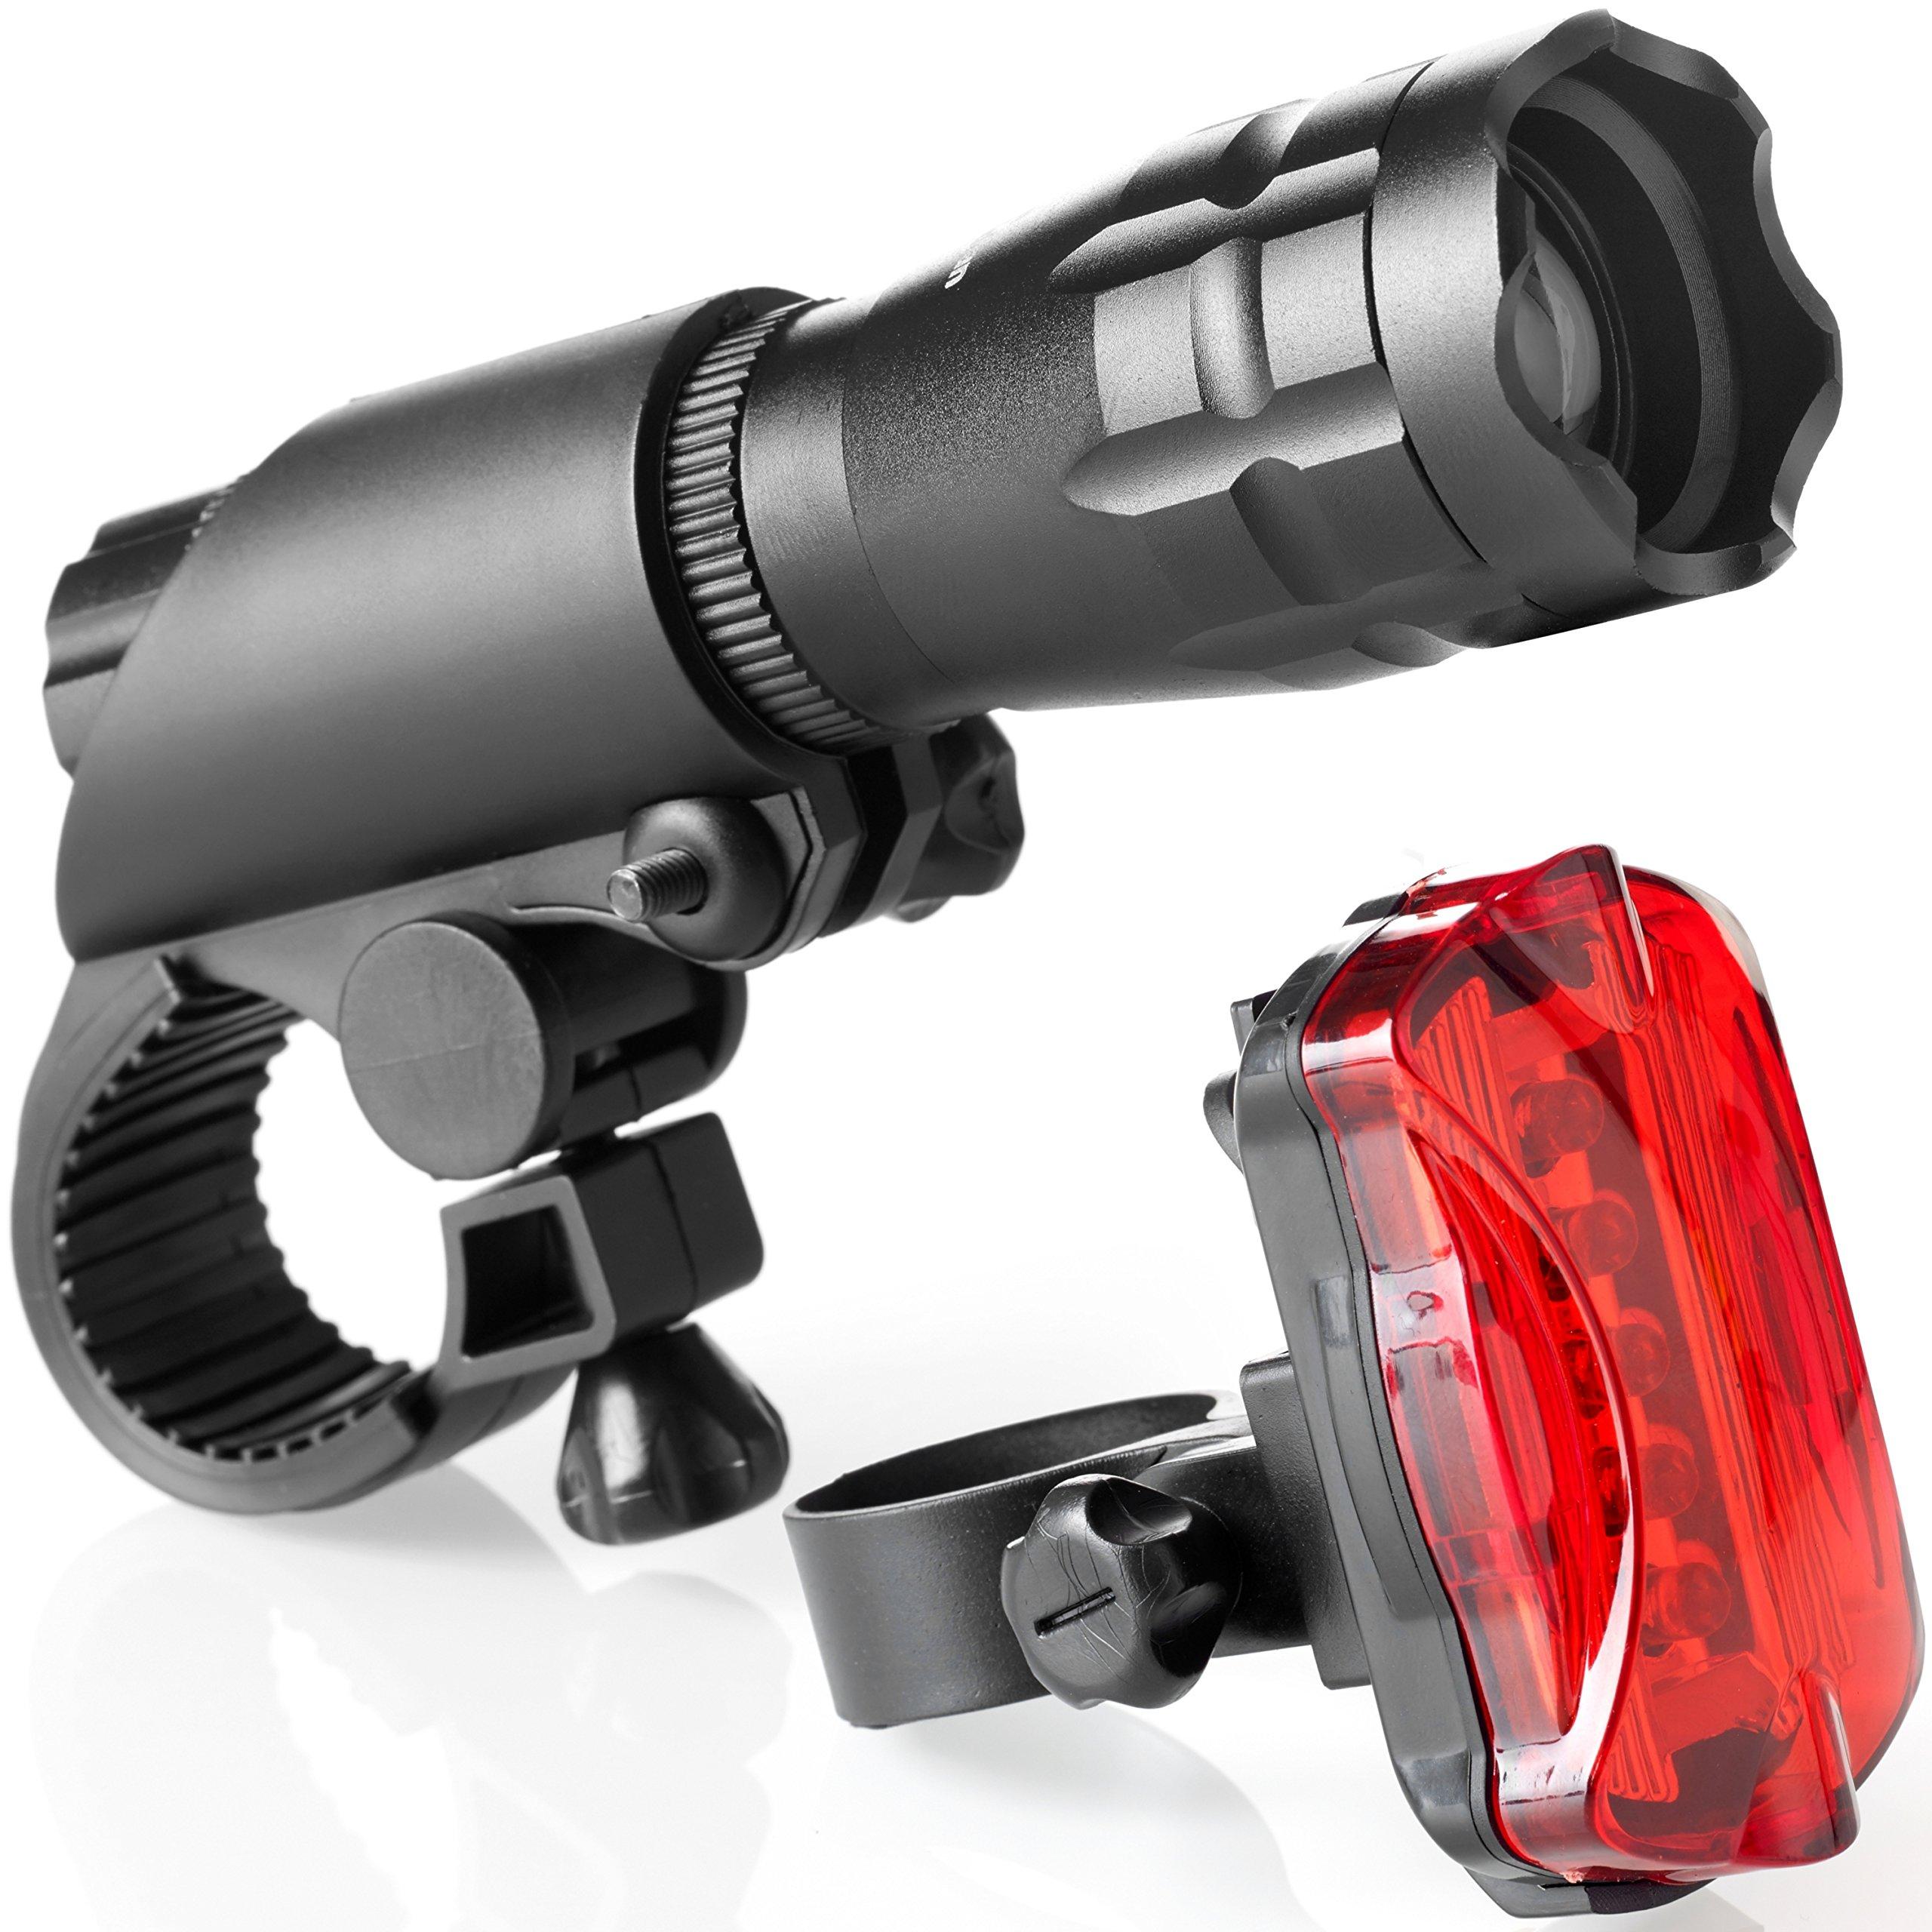 Juego de Luces para Bicicleta - Luces LED Súper Brillantes para su Bicicleta - Fácil Montaje del Faro